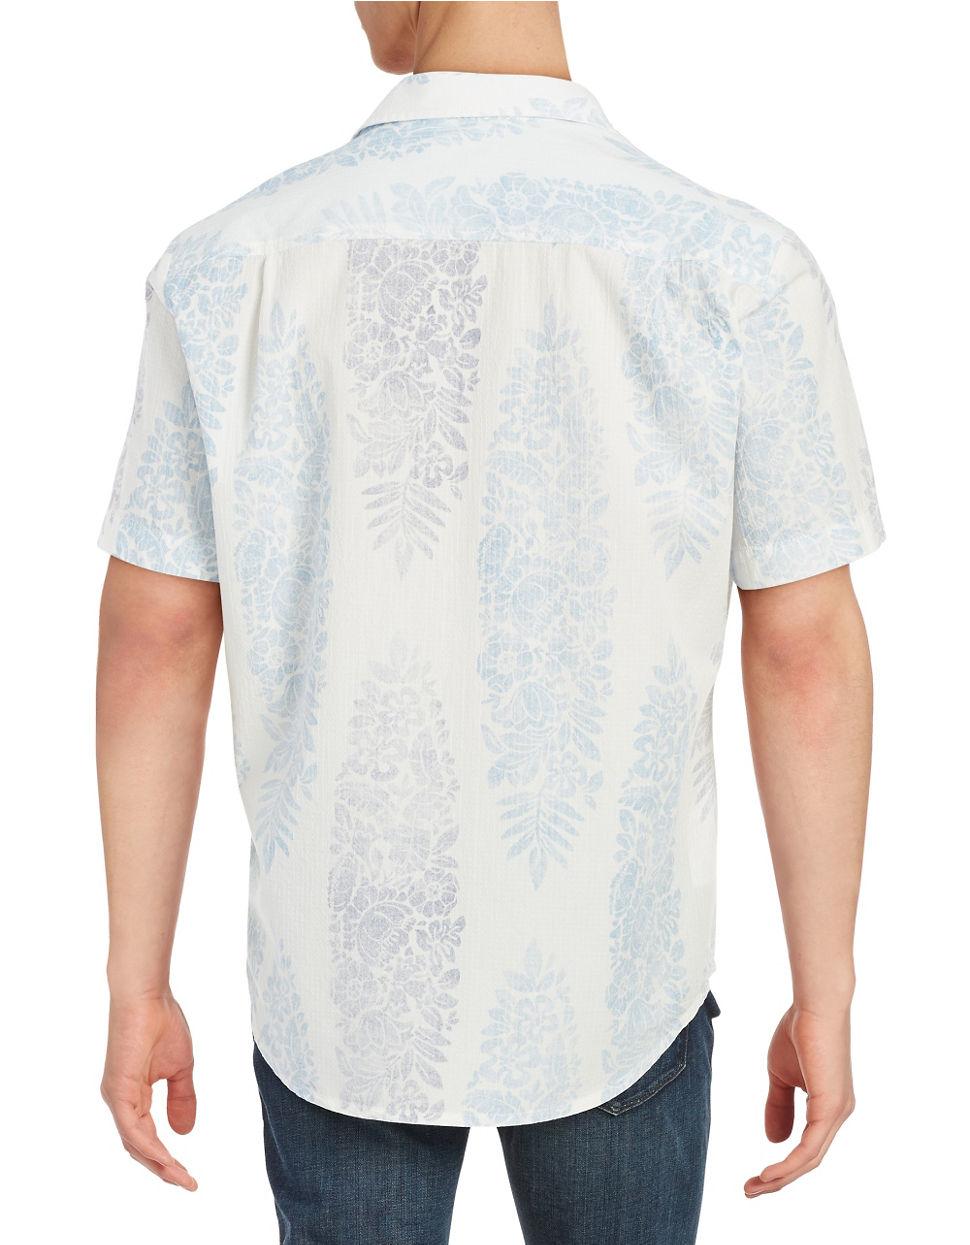 bahama Vintage shirts tommy